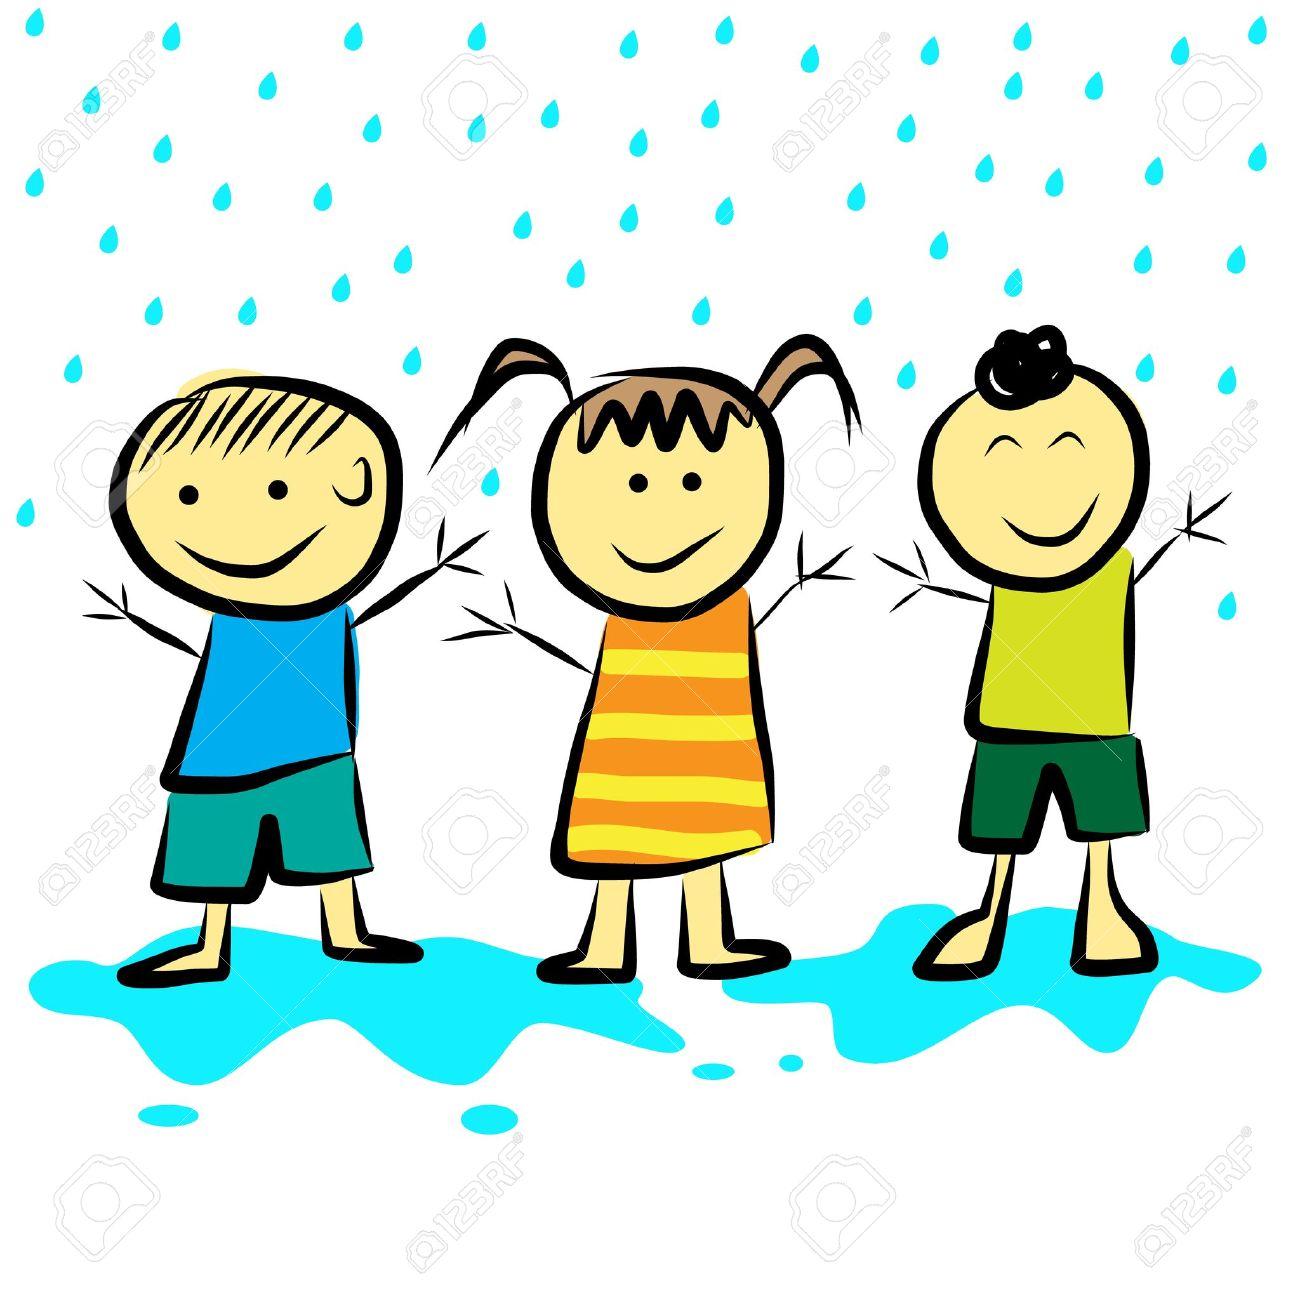 Dancing in the rain clipart.